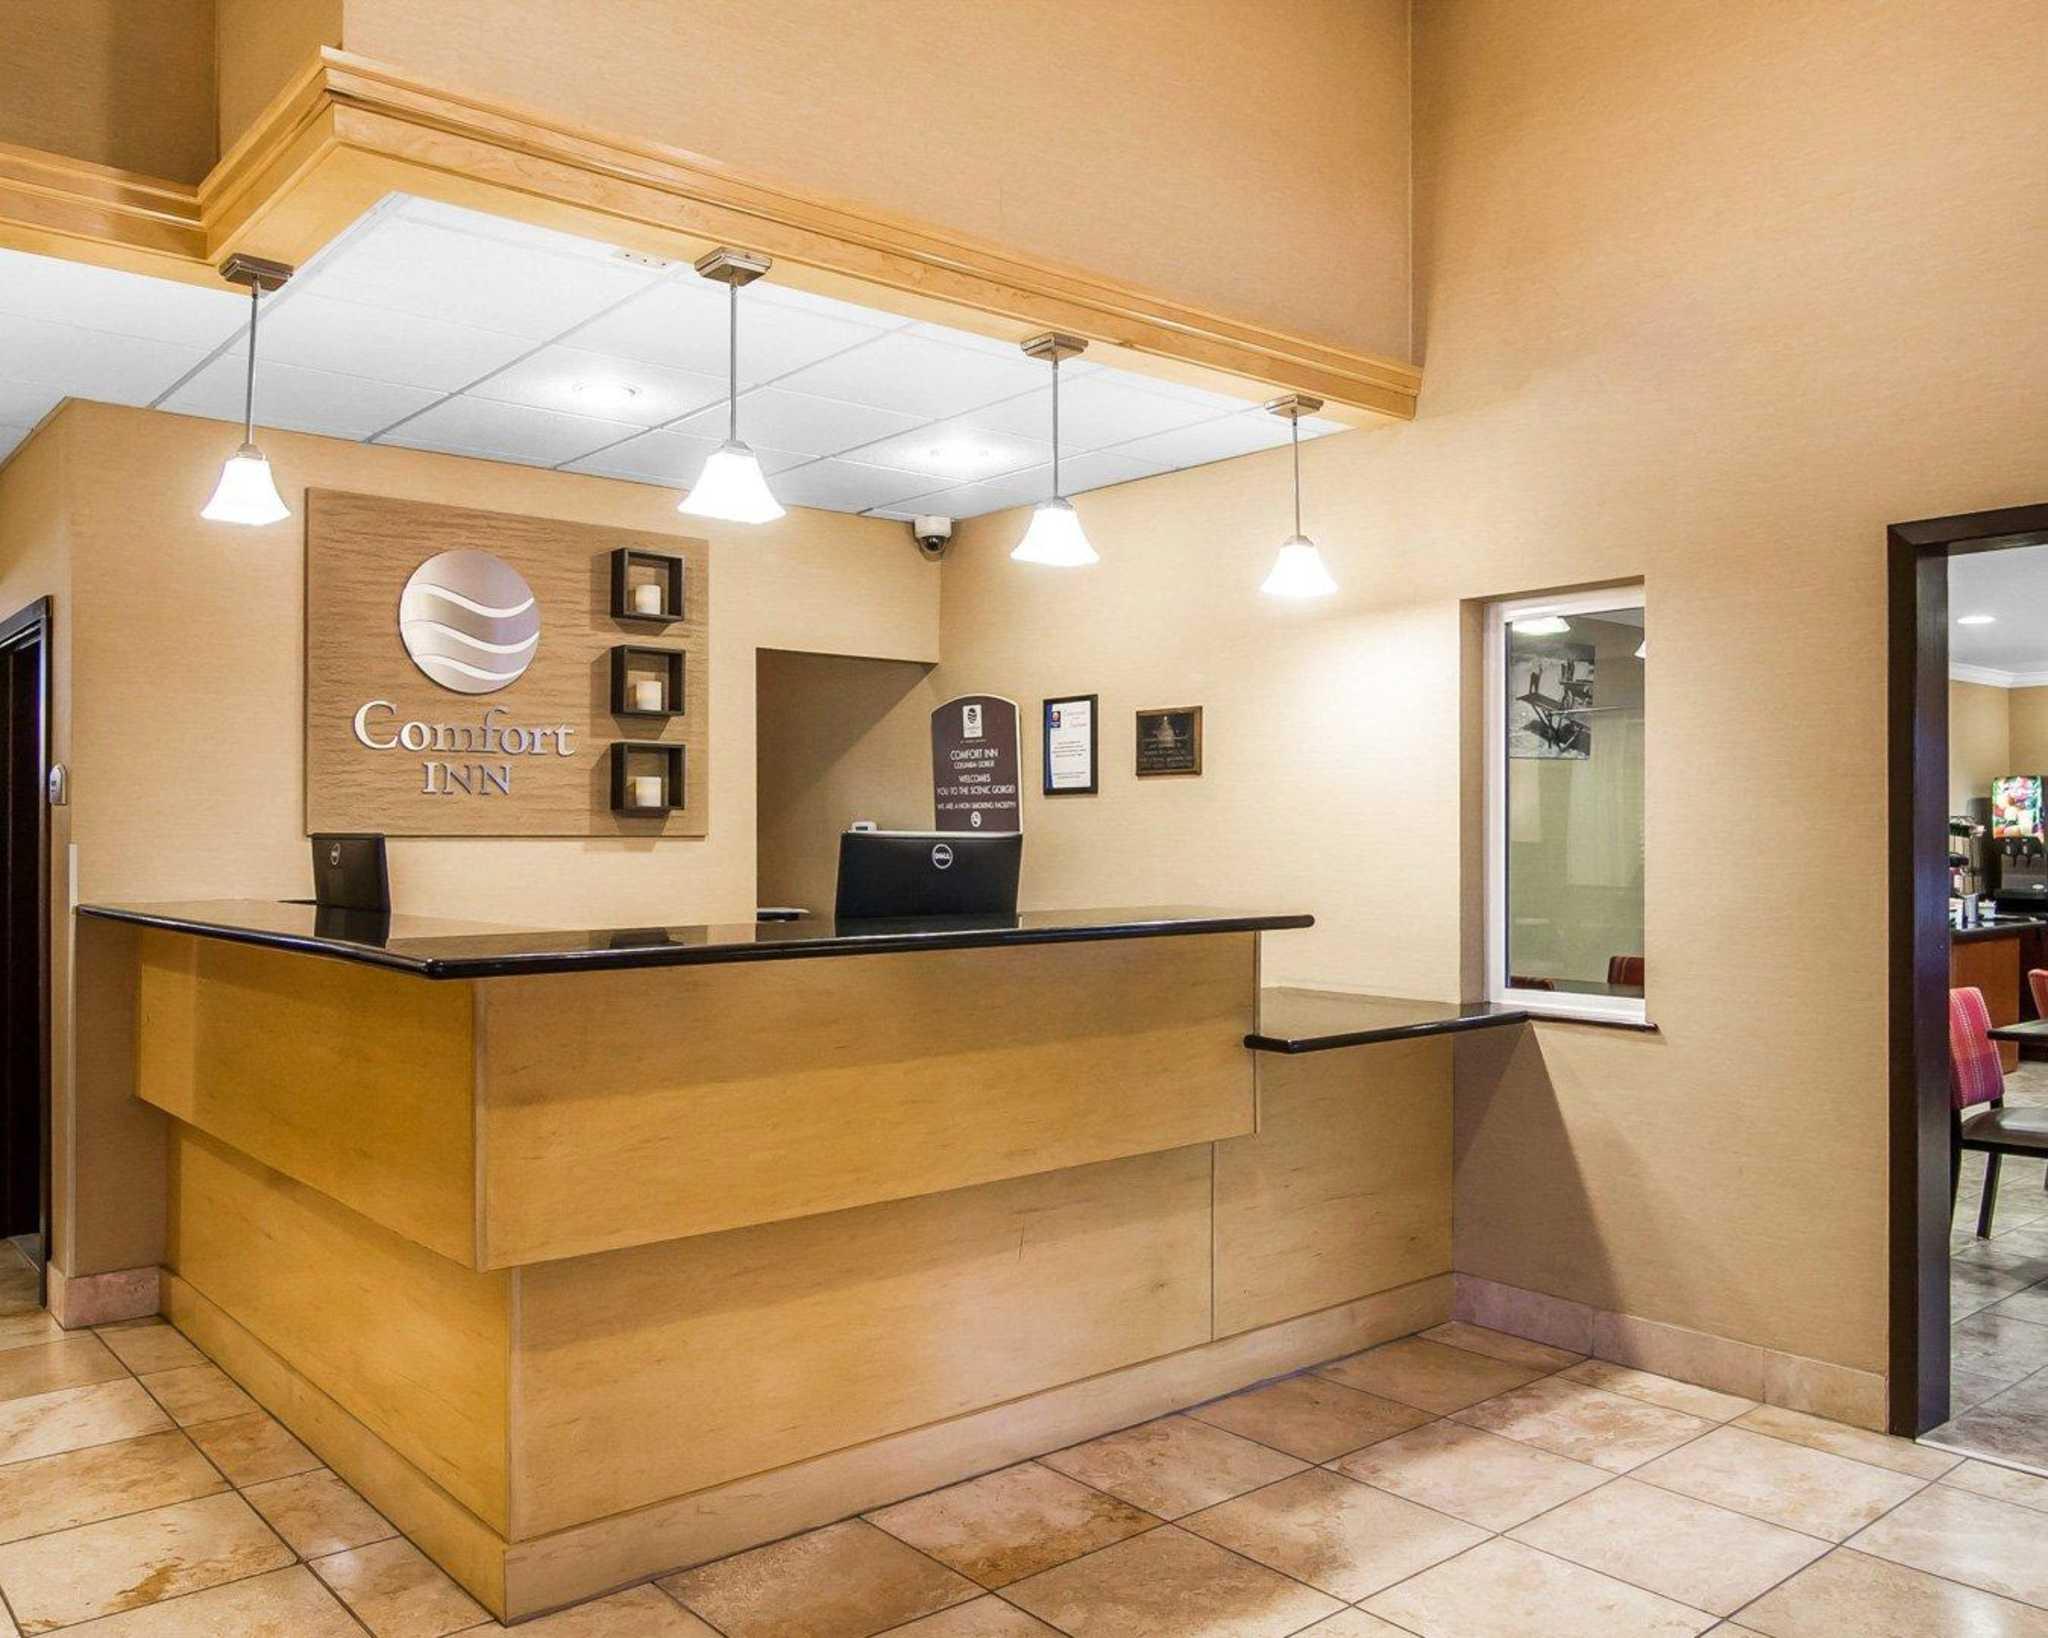 the dalles or comfort inn find comfort inn in the. Black Bedroom Furniture Sets. Home Design Ideas